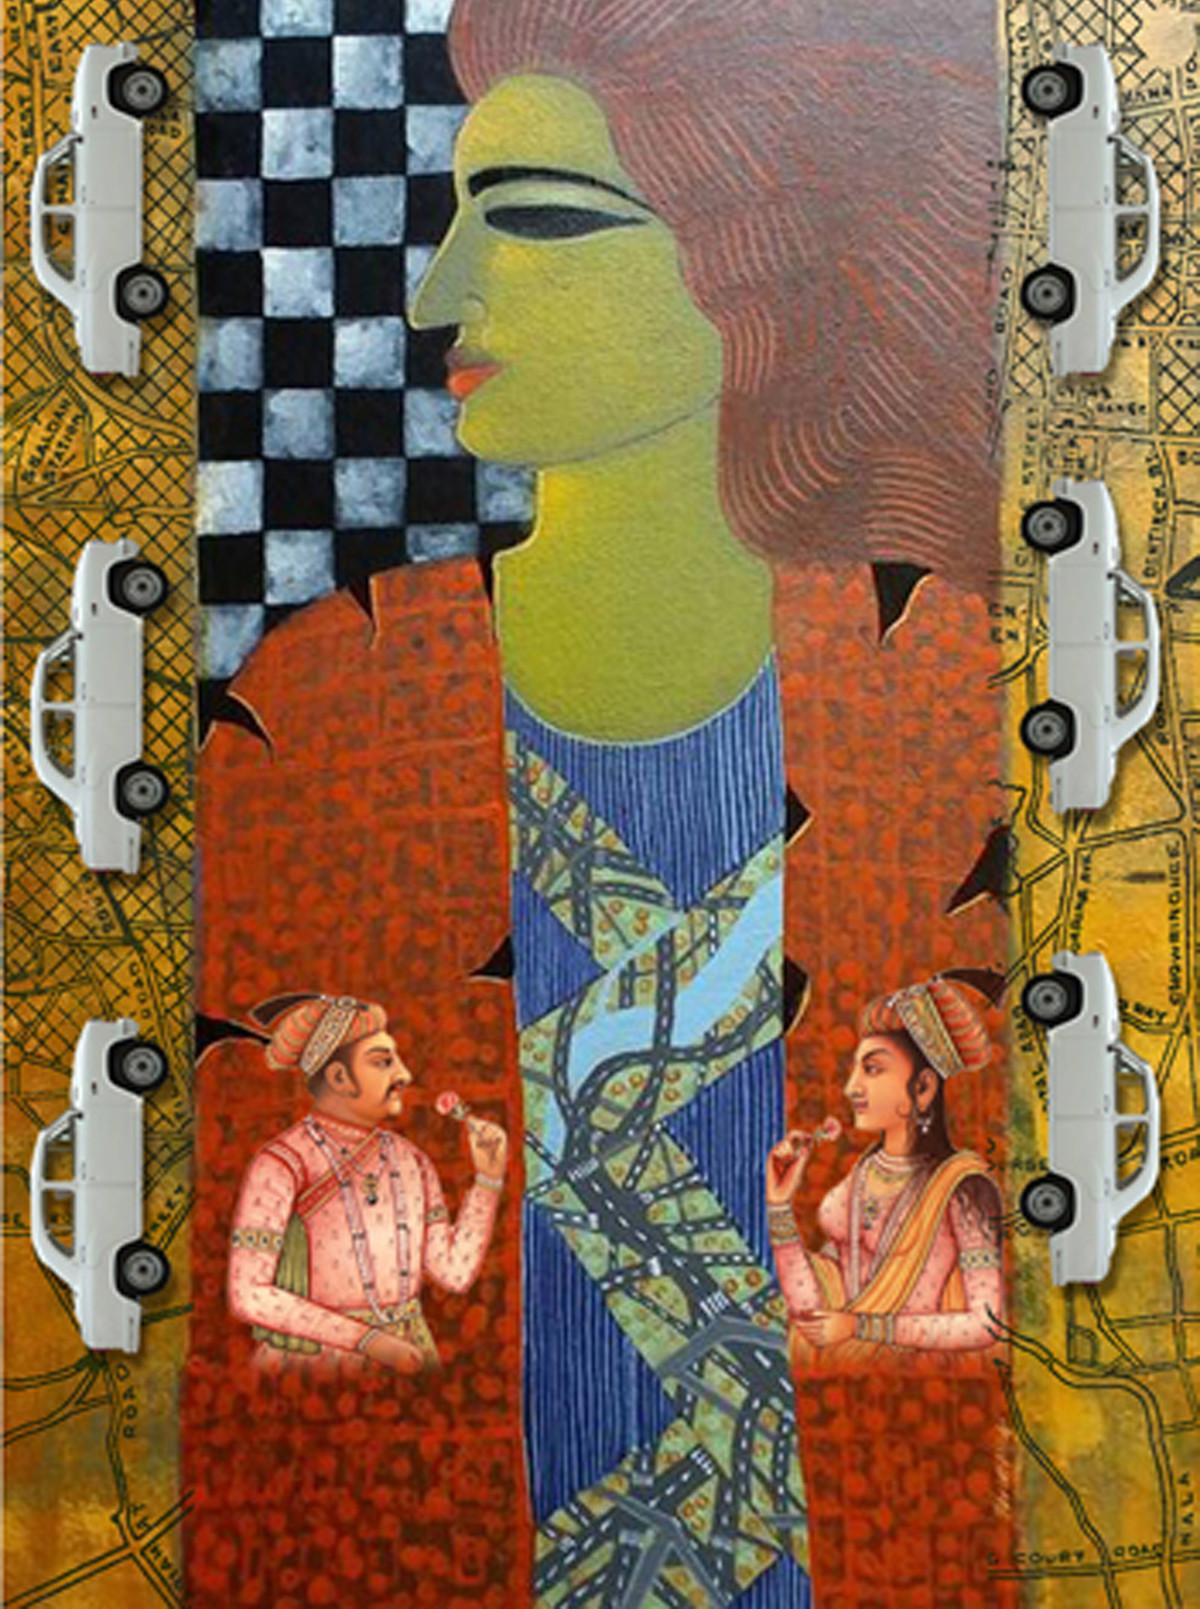 UNTITLED IV by ARINDAM CHAKRABORTY, Digital Digital Art, Digital Print on Archival Paper, Red color